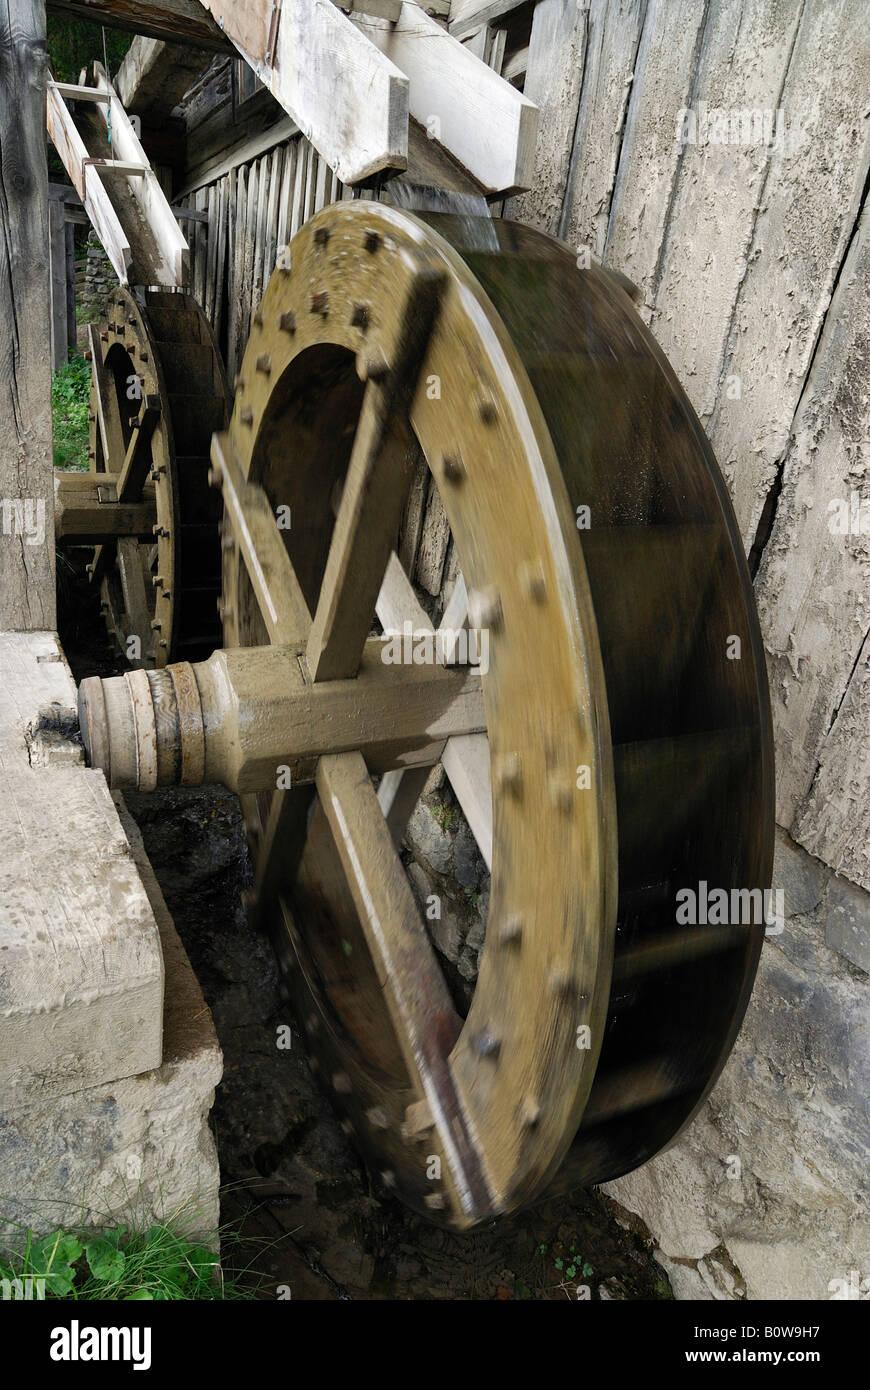 Mill wheel - Stock Image